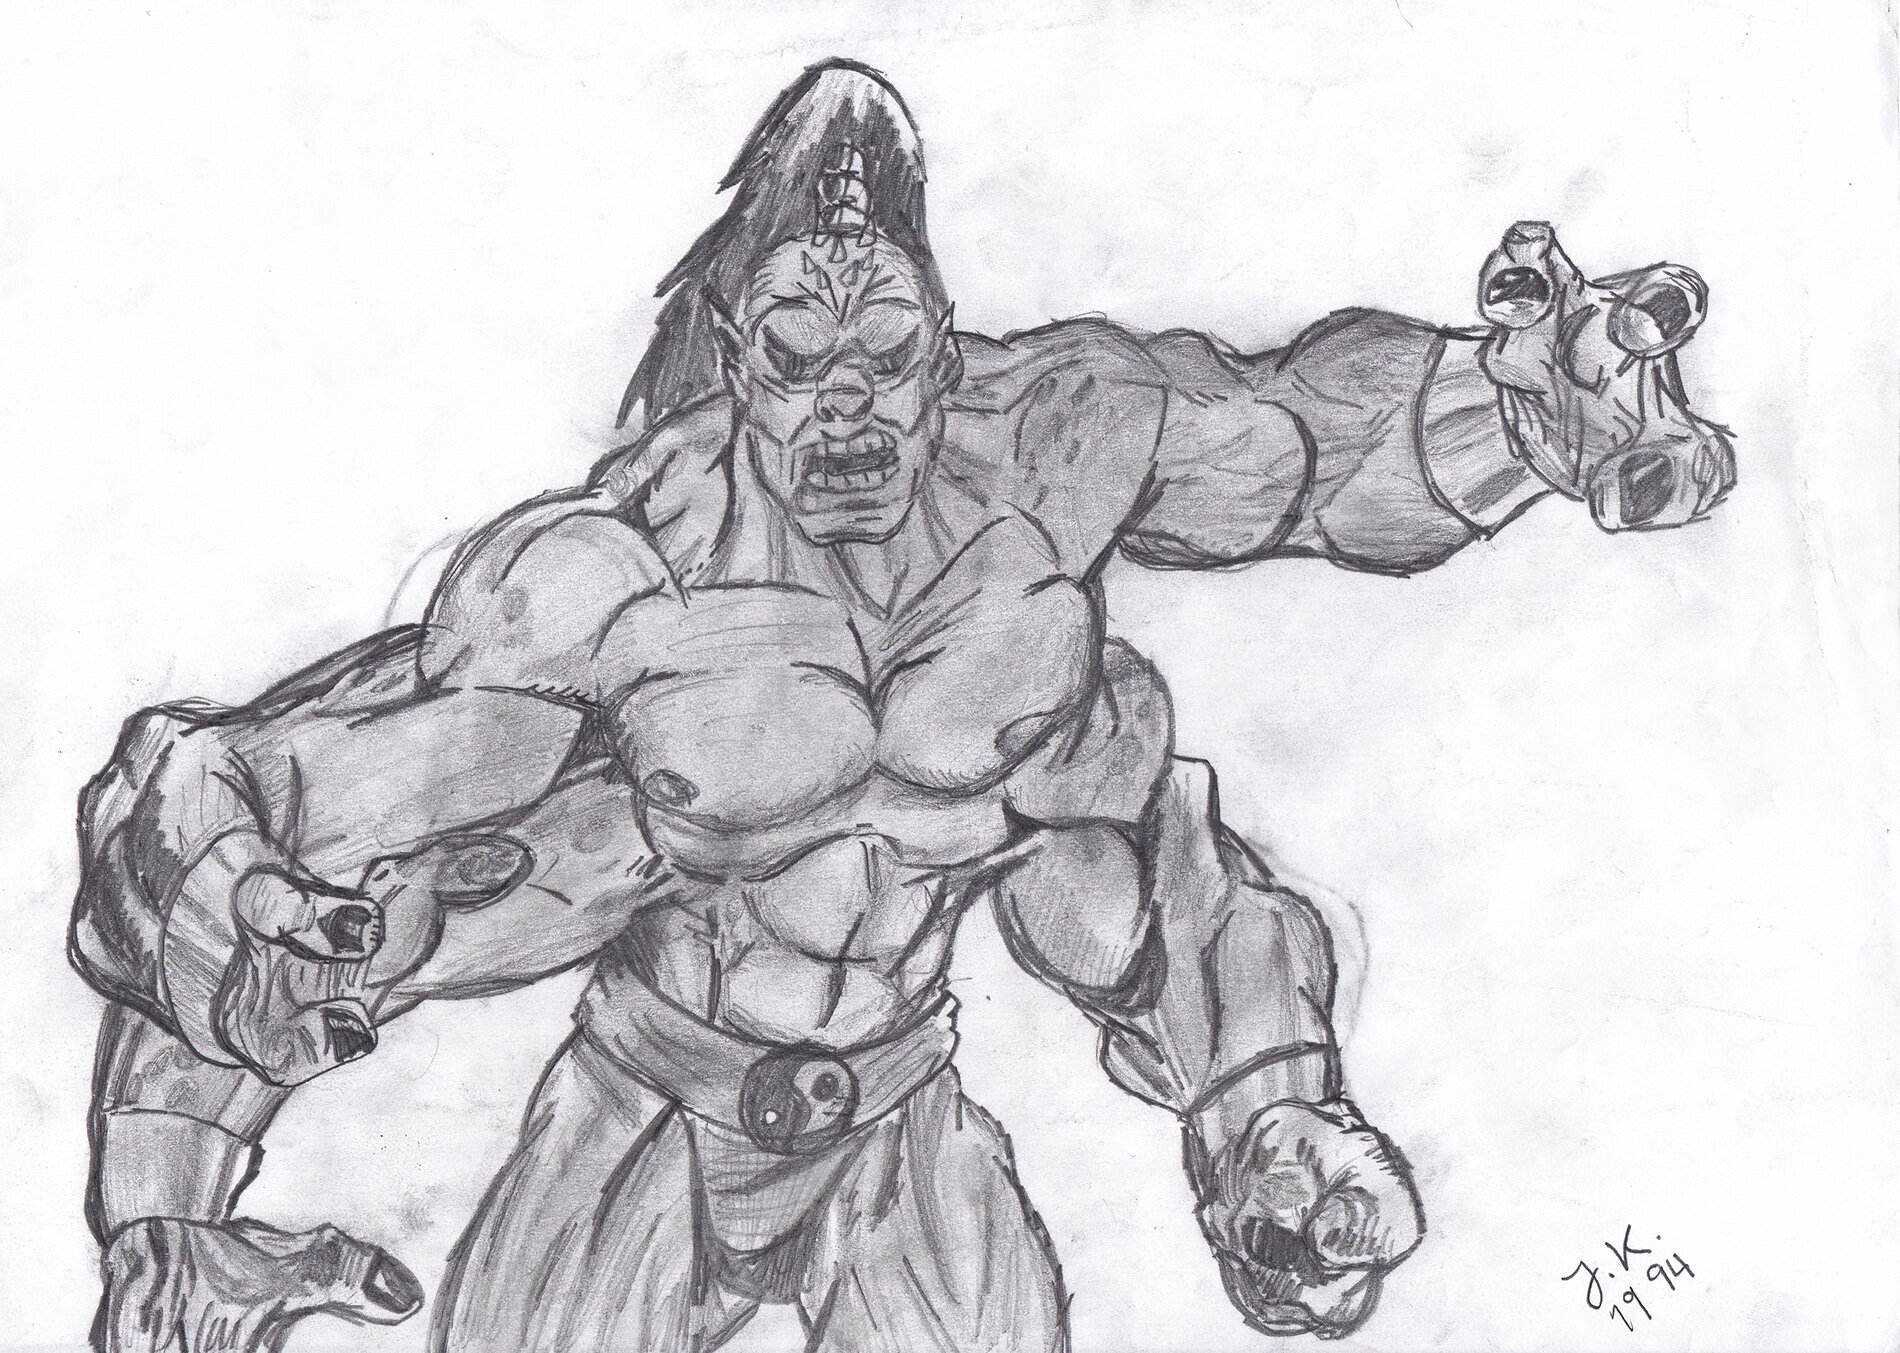 Mortal Kombat: Goro (1994)